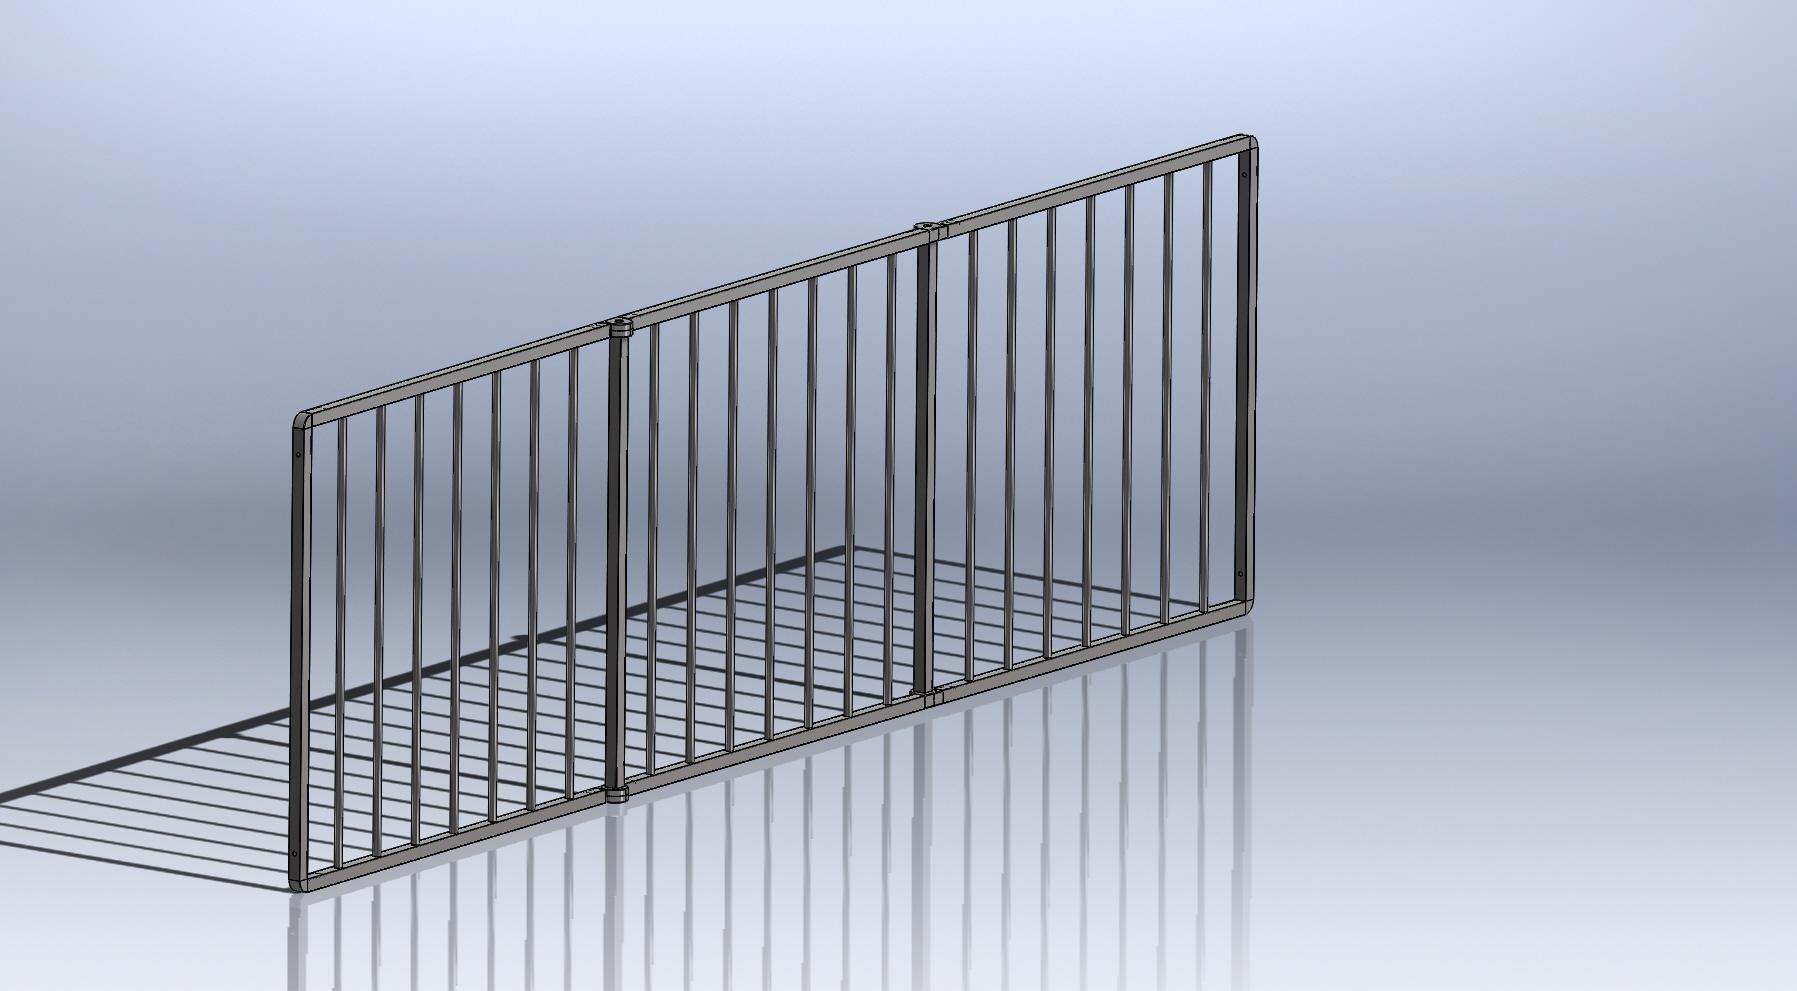 faltzaun aus aluminium als mobiler zaun f r wohnwagen wohnmobil welpenzaun sm rt 99. Black Bedroom Furniture Sets. Home Design Ideas